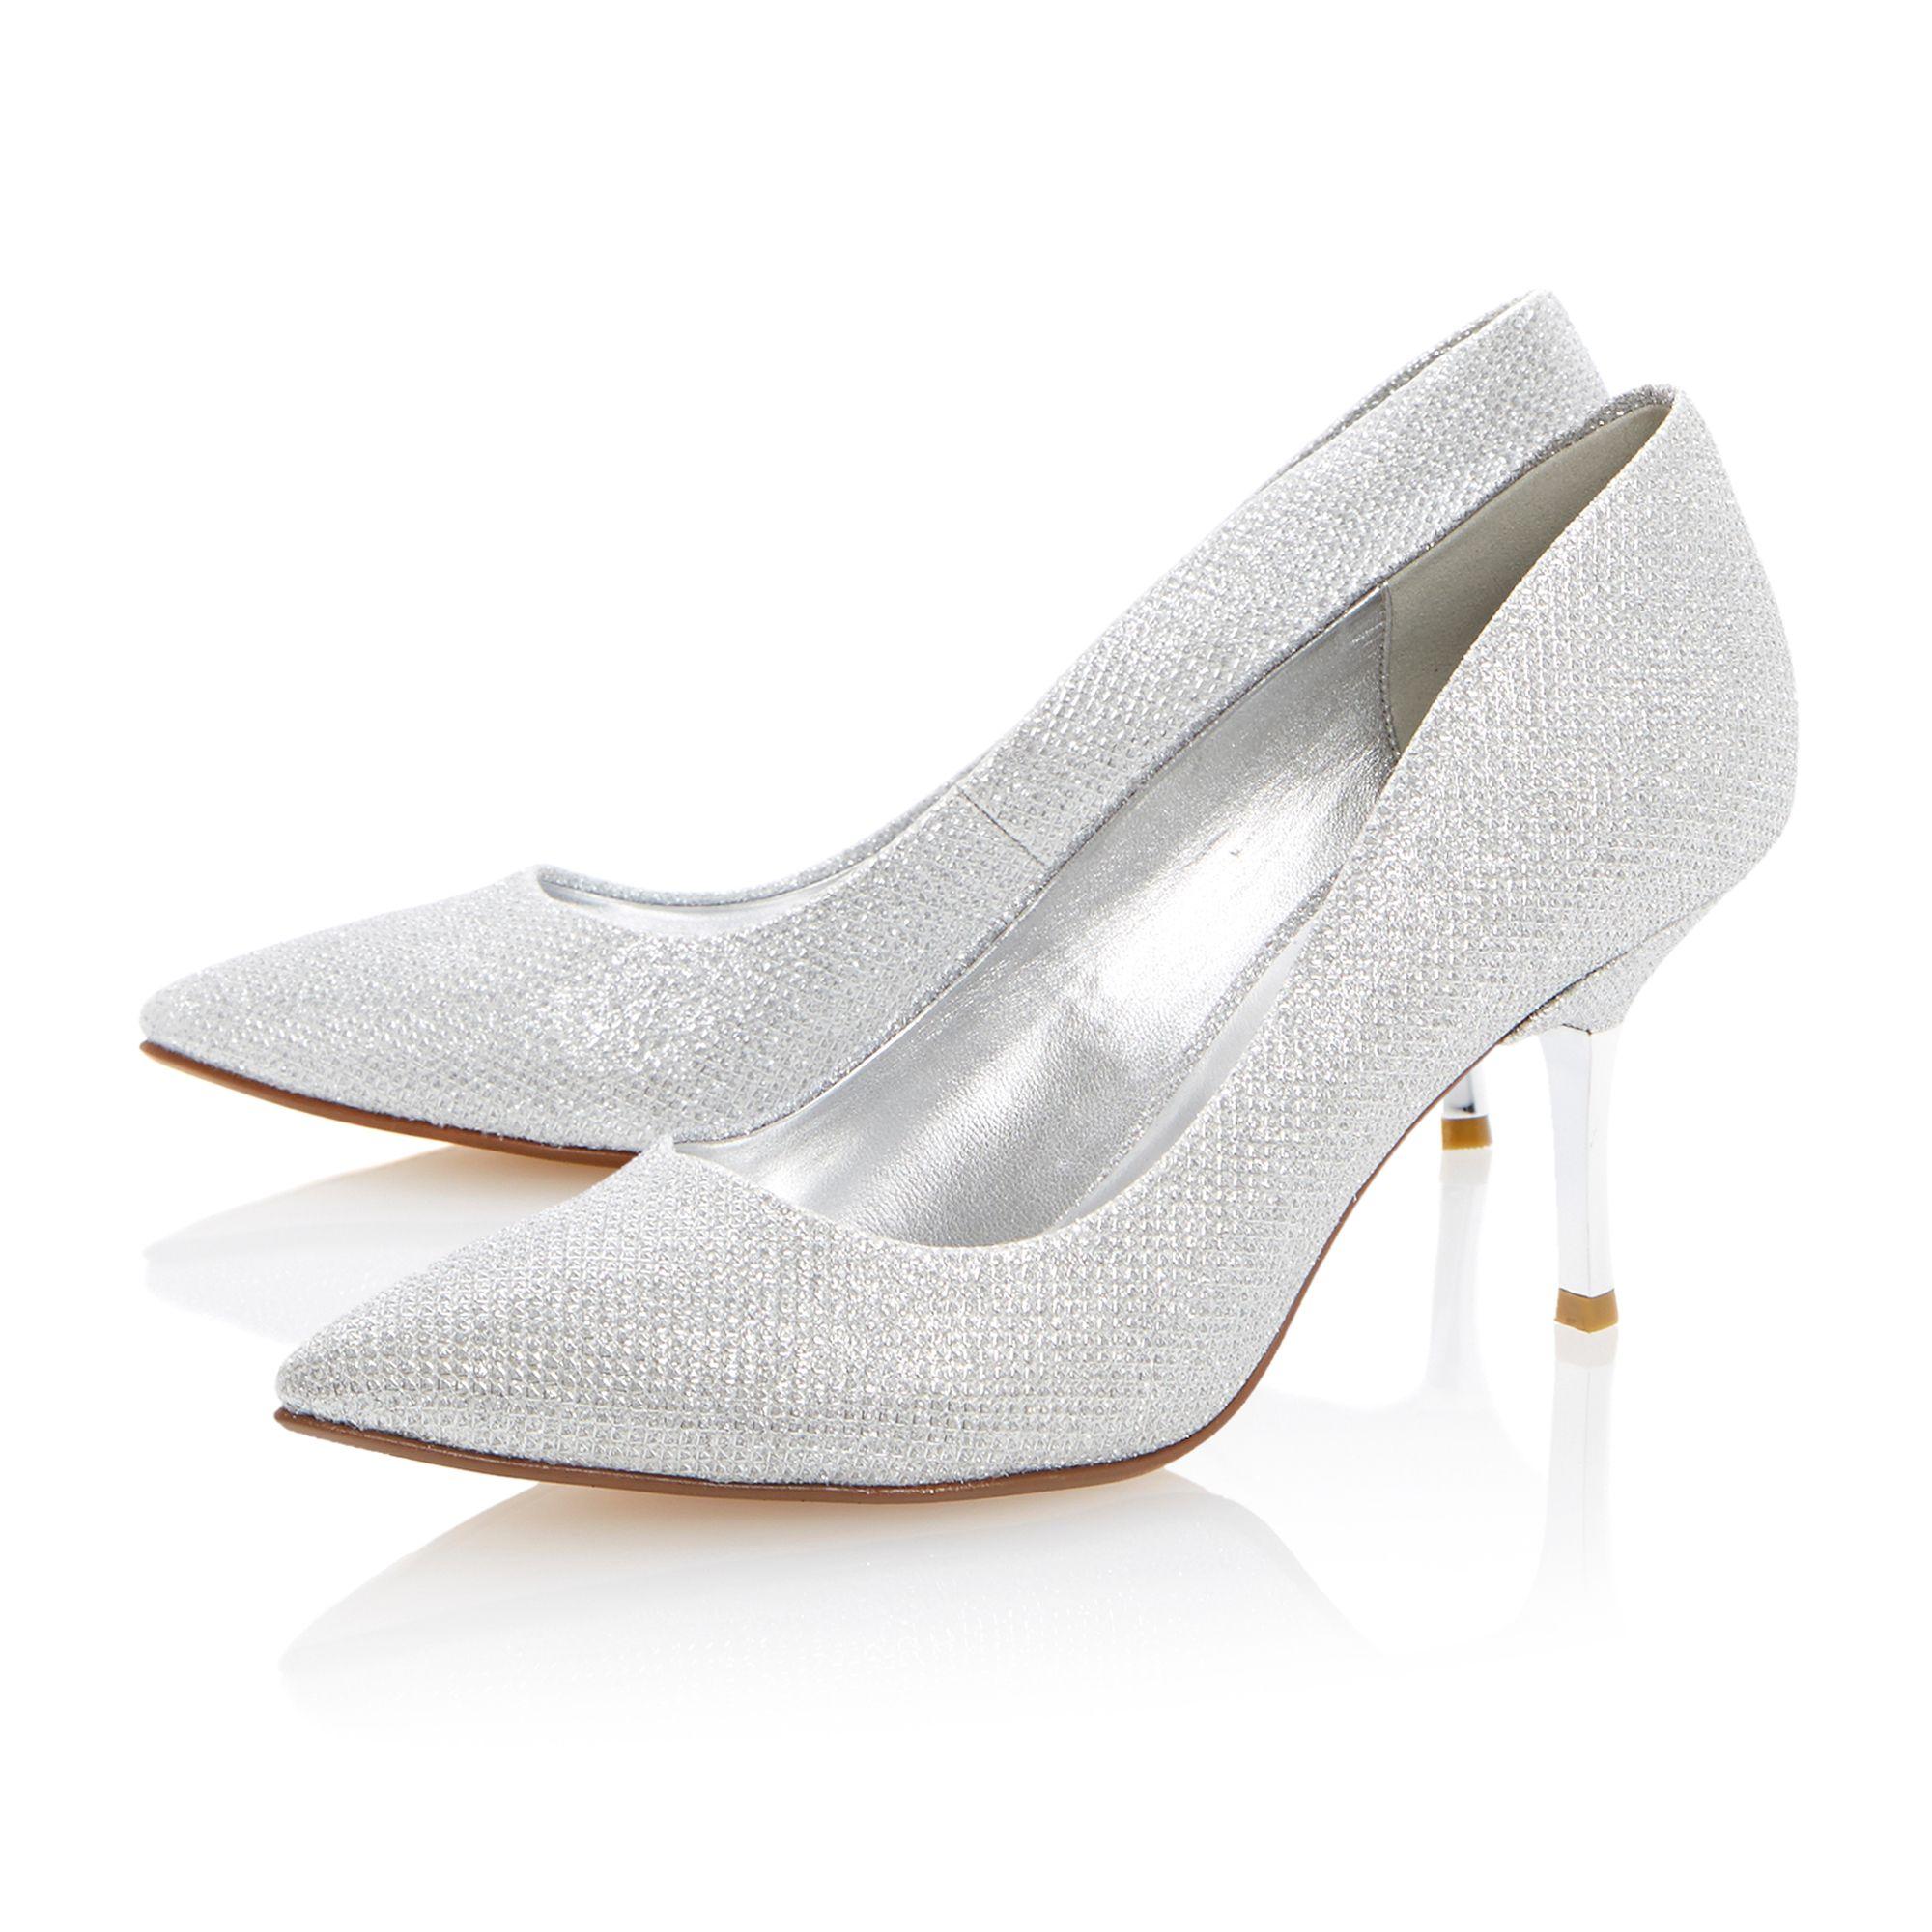 Kitten Heeled Silver Court Shoe